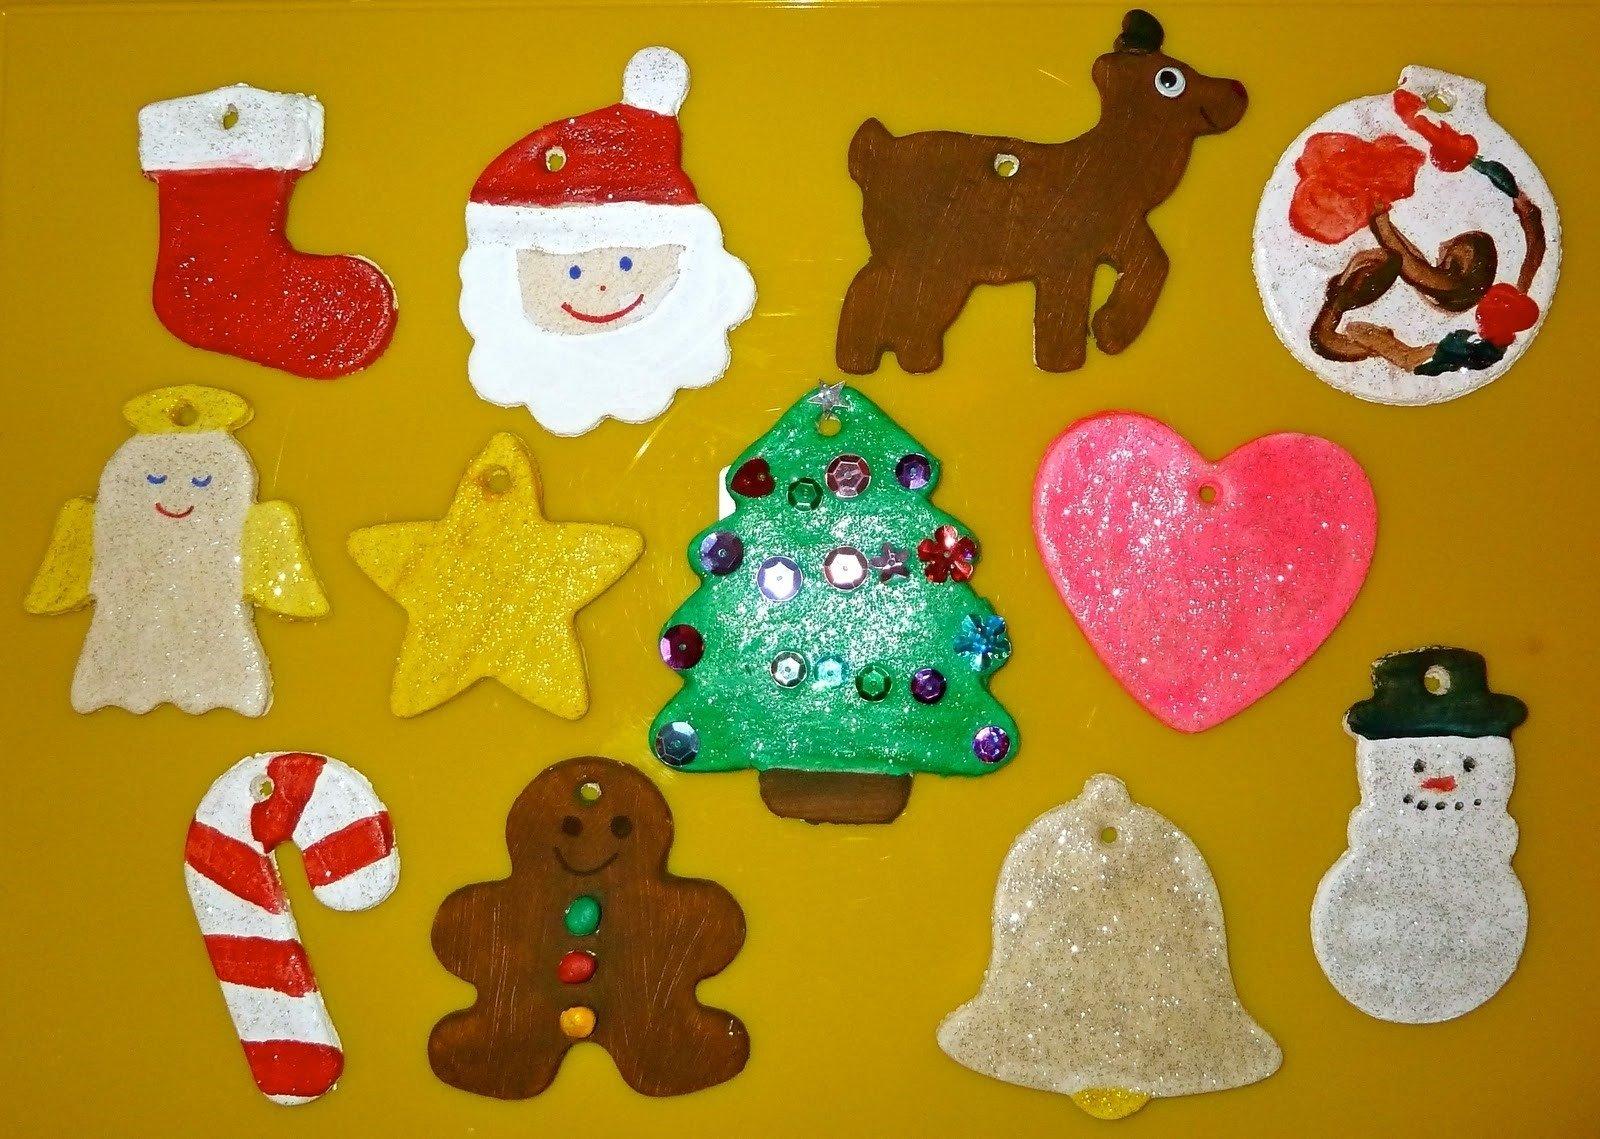 10 cute christmas decoration ideas for kids kids craft christmas decorations find craft ideas - Christmas Decoration Ideas For Kids